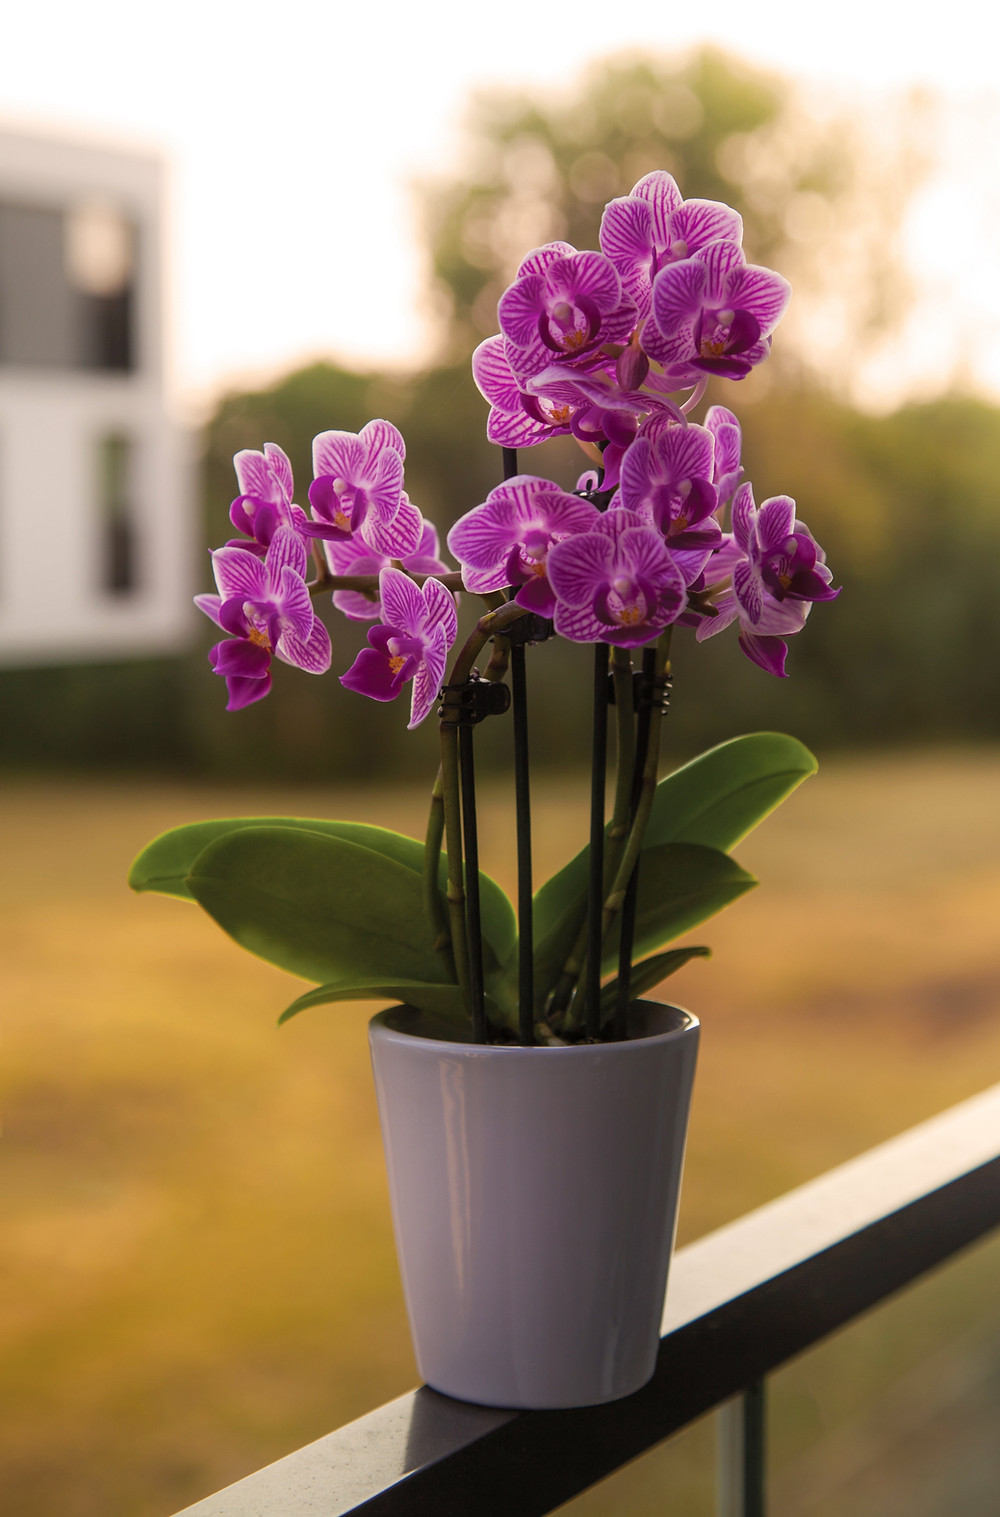 orchid flowers contain ocimene terpenes